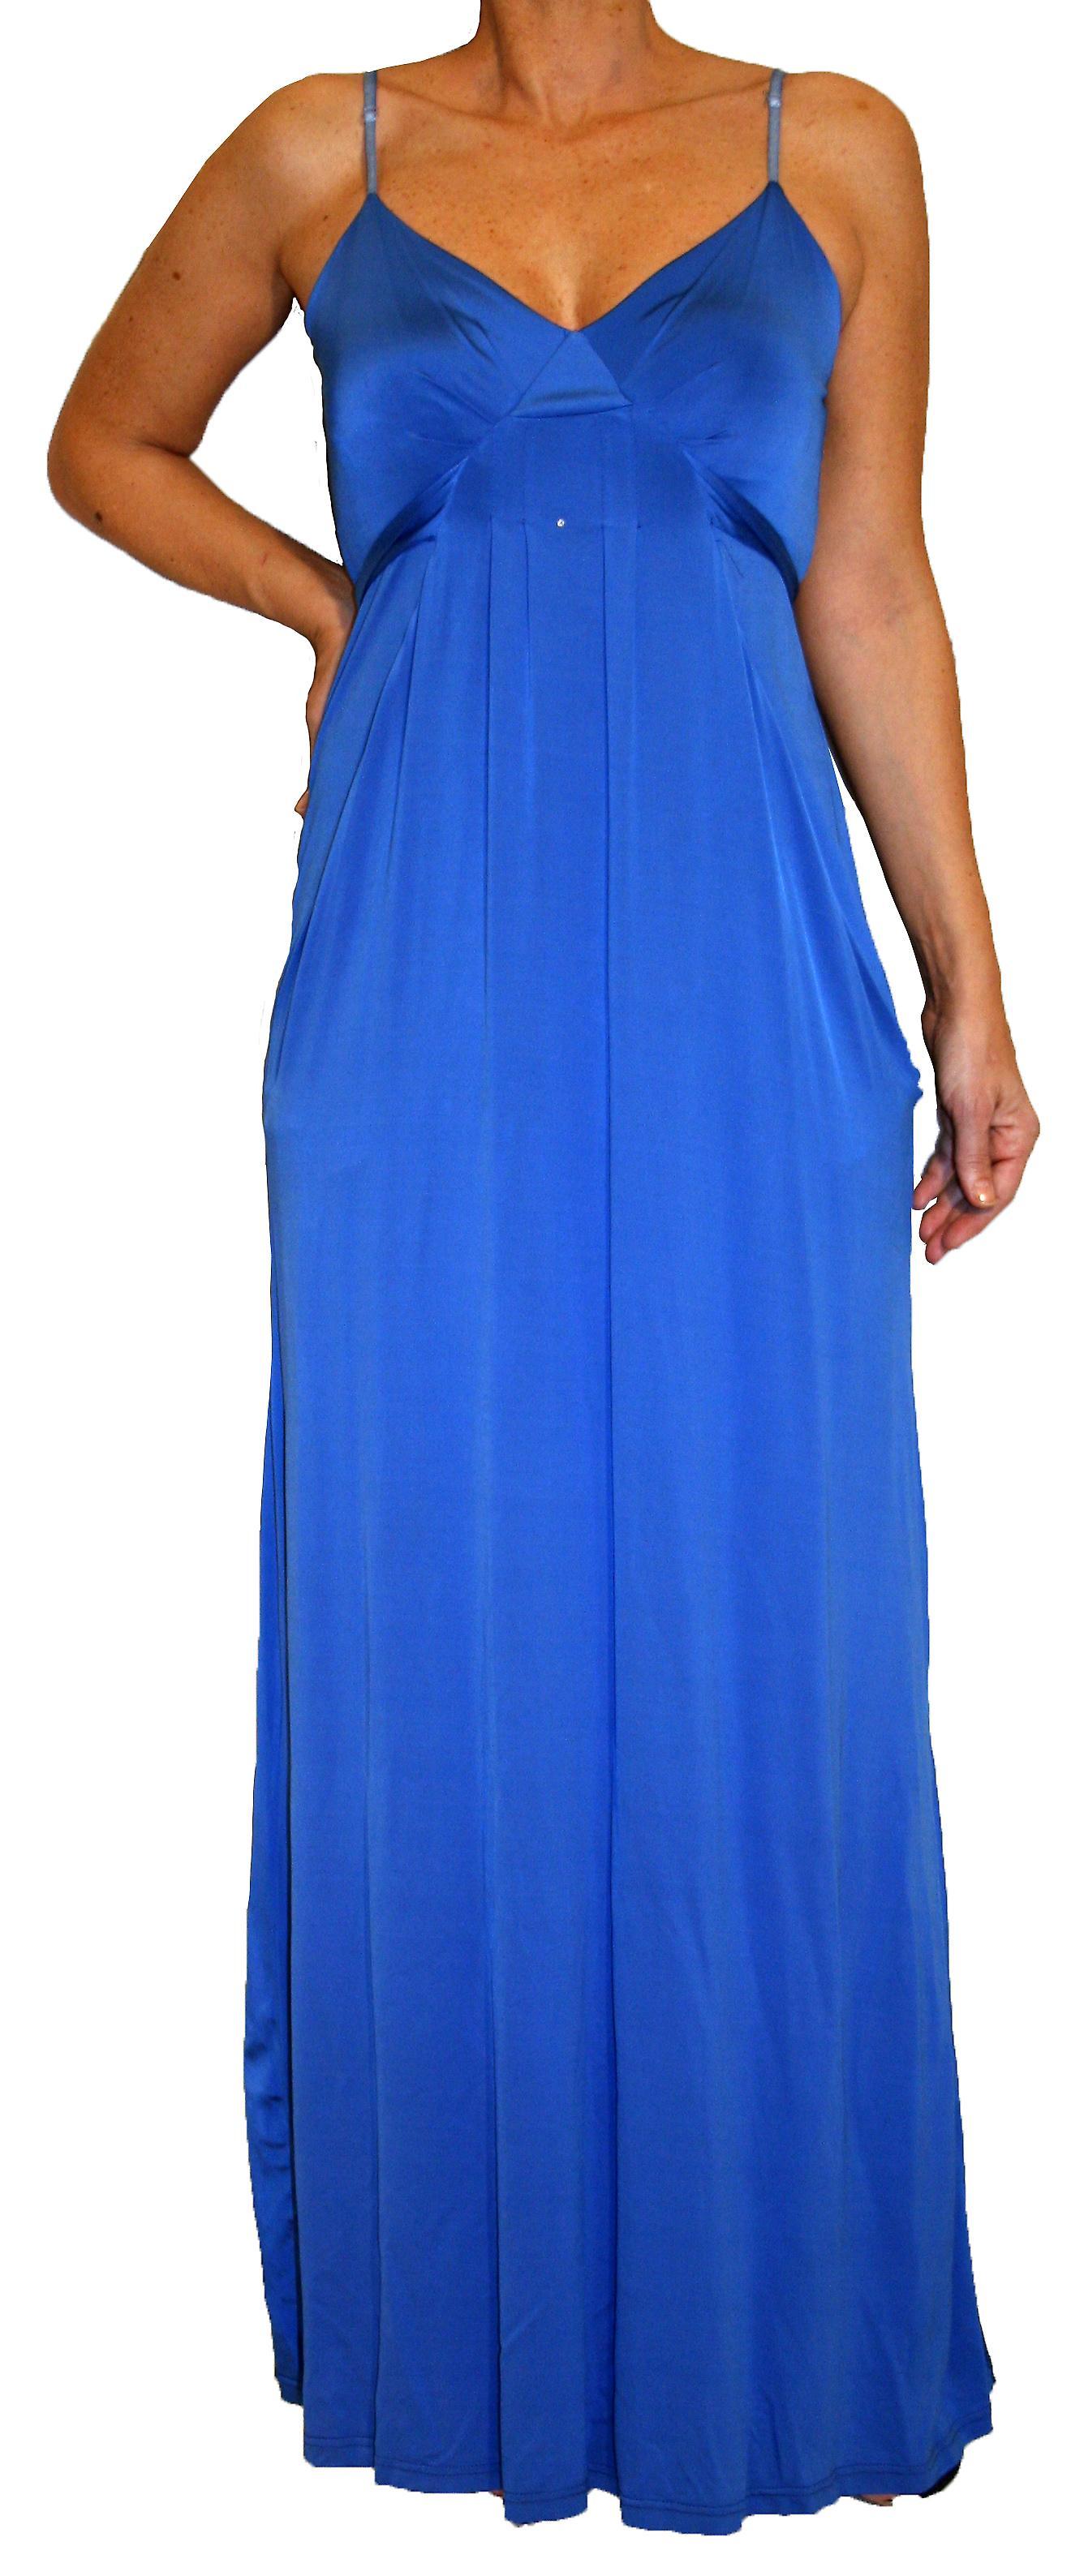 Waooh - Fashion - Dress